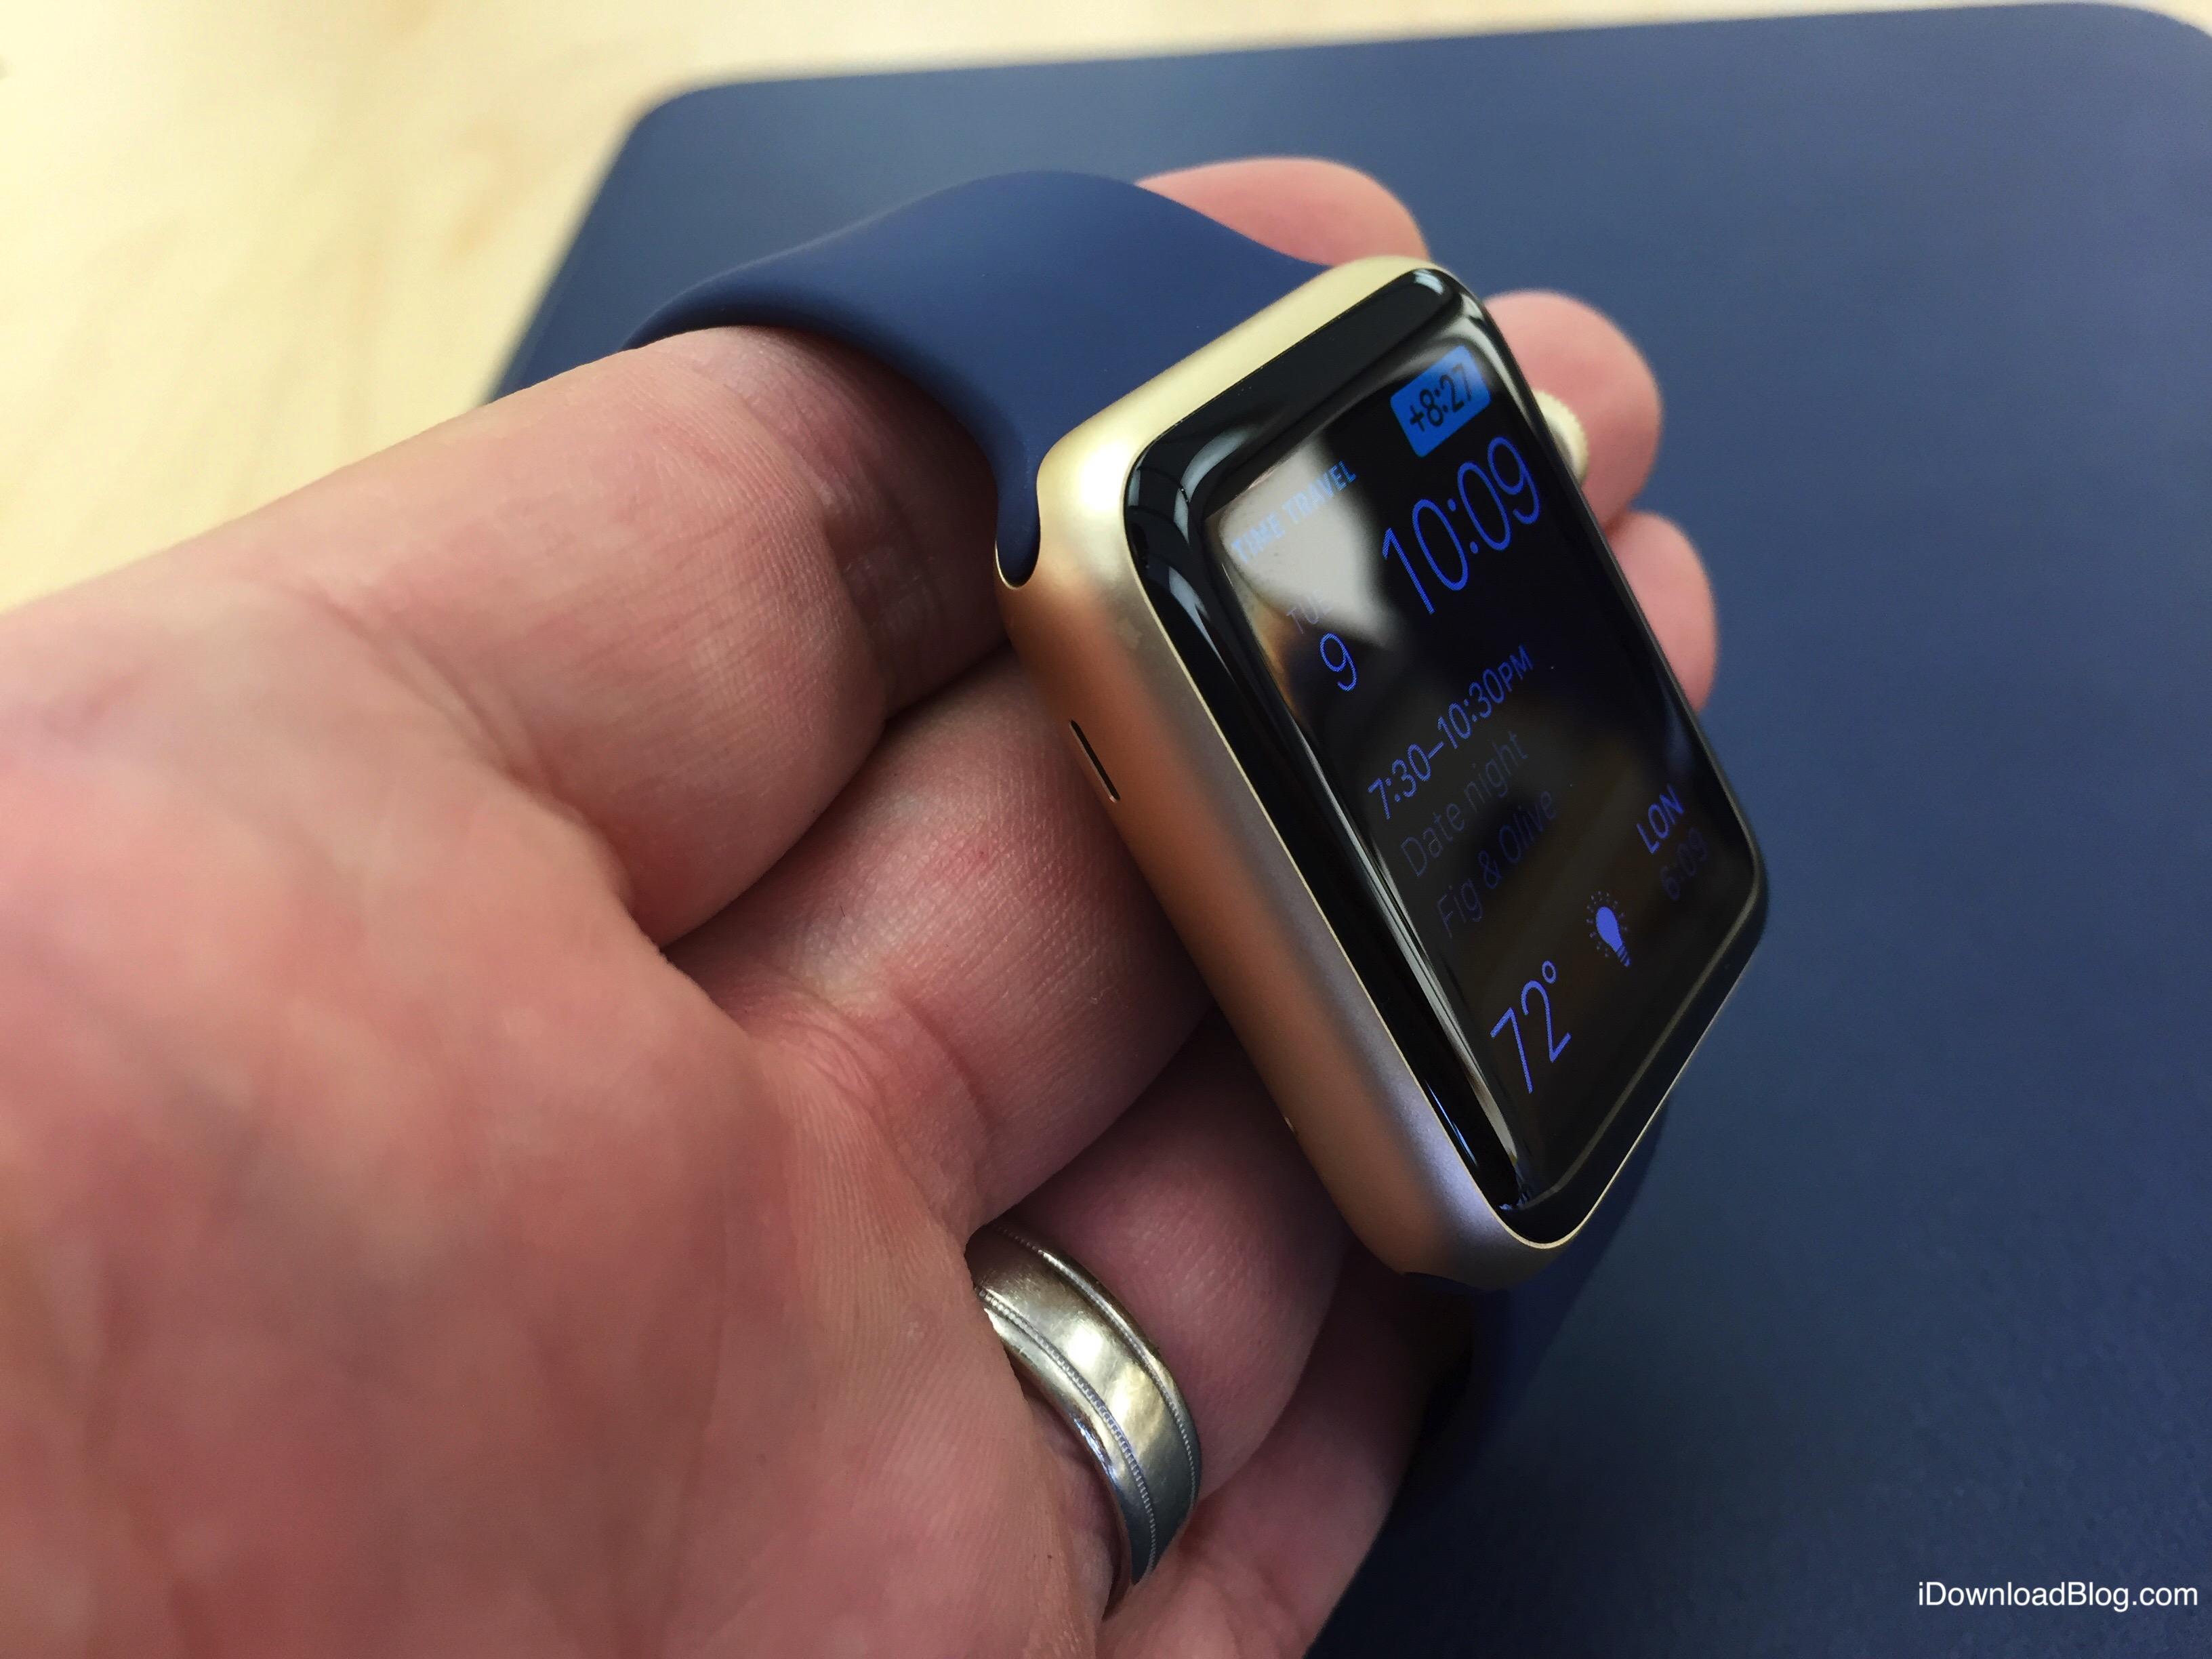 Gold Aluminum Apple Watch Hands on 6